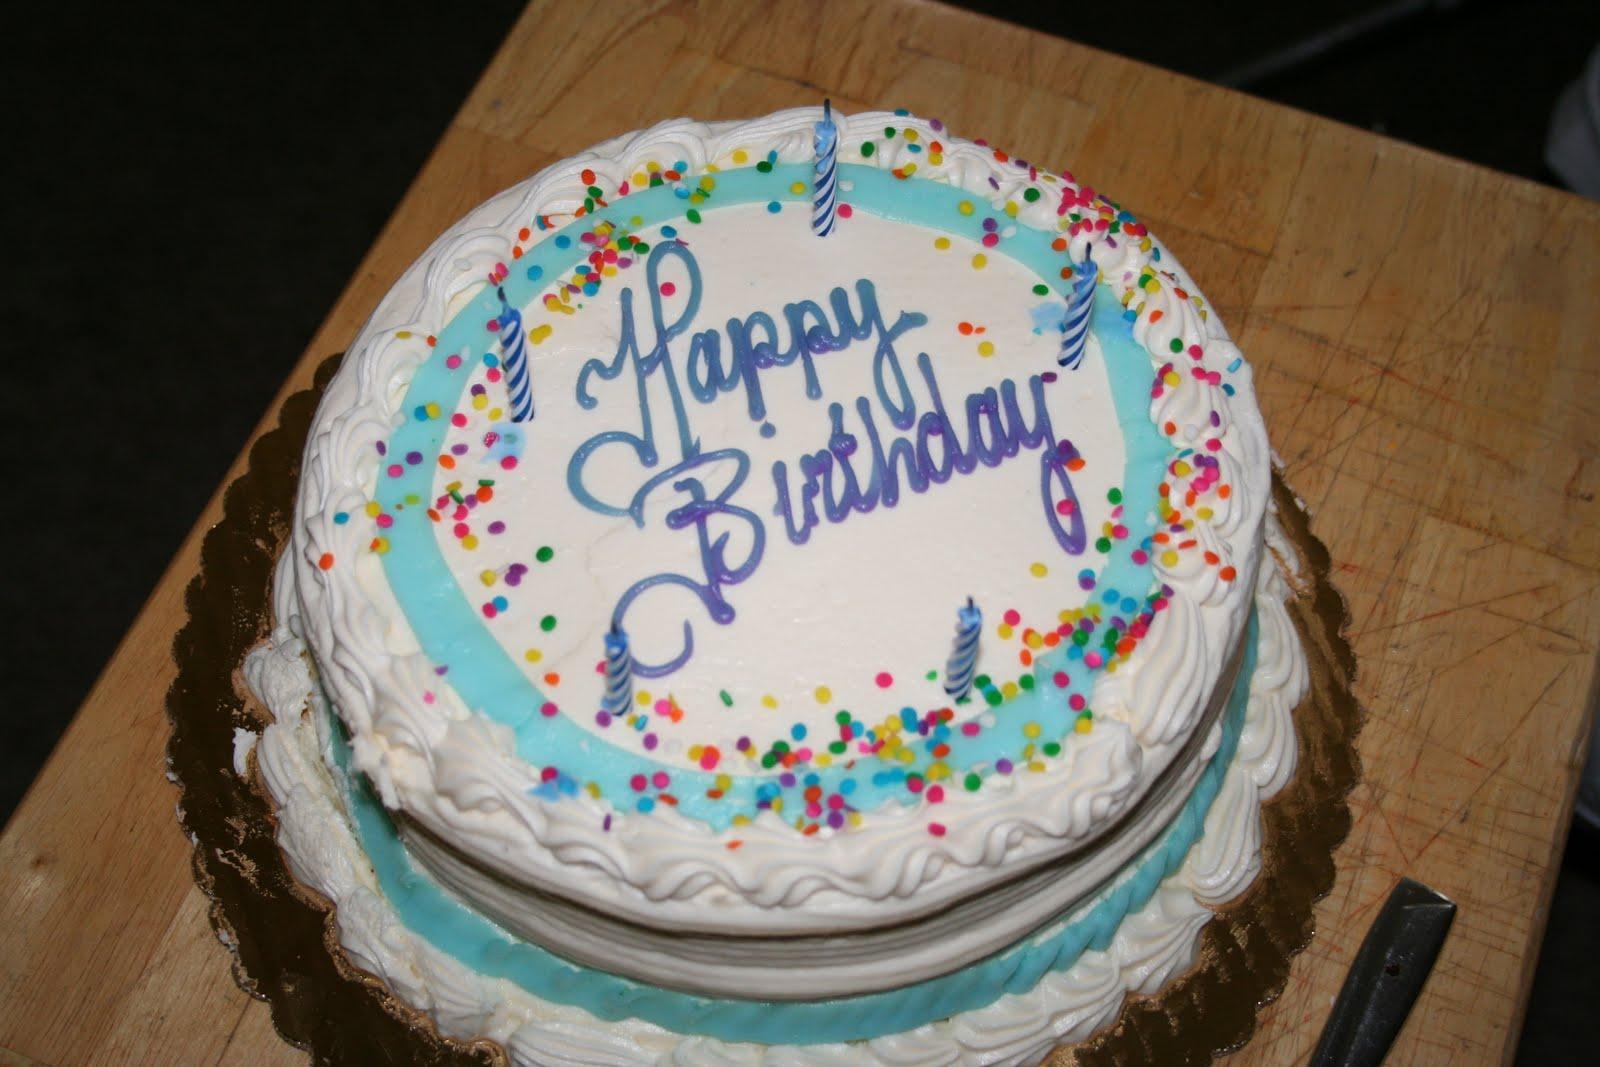 Creative Journeys Happy Birthday Xavier